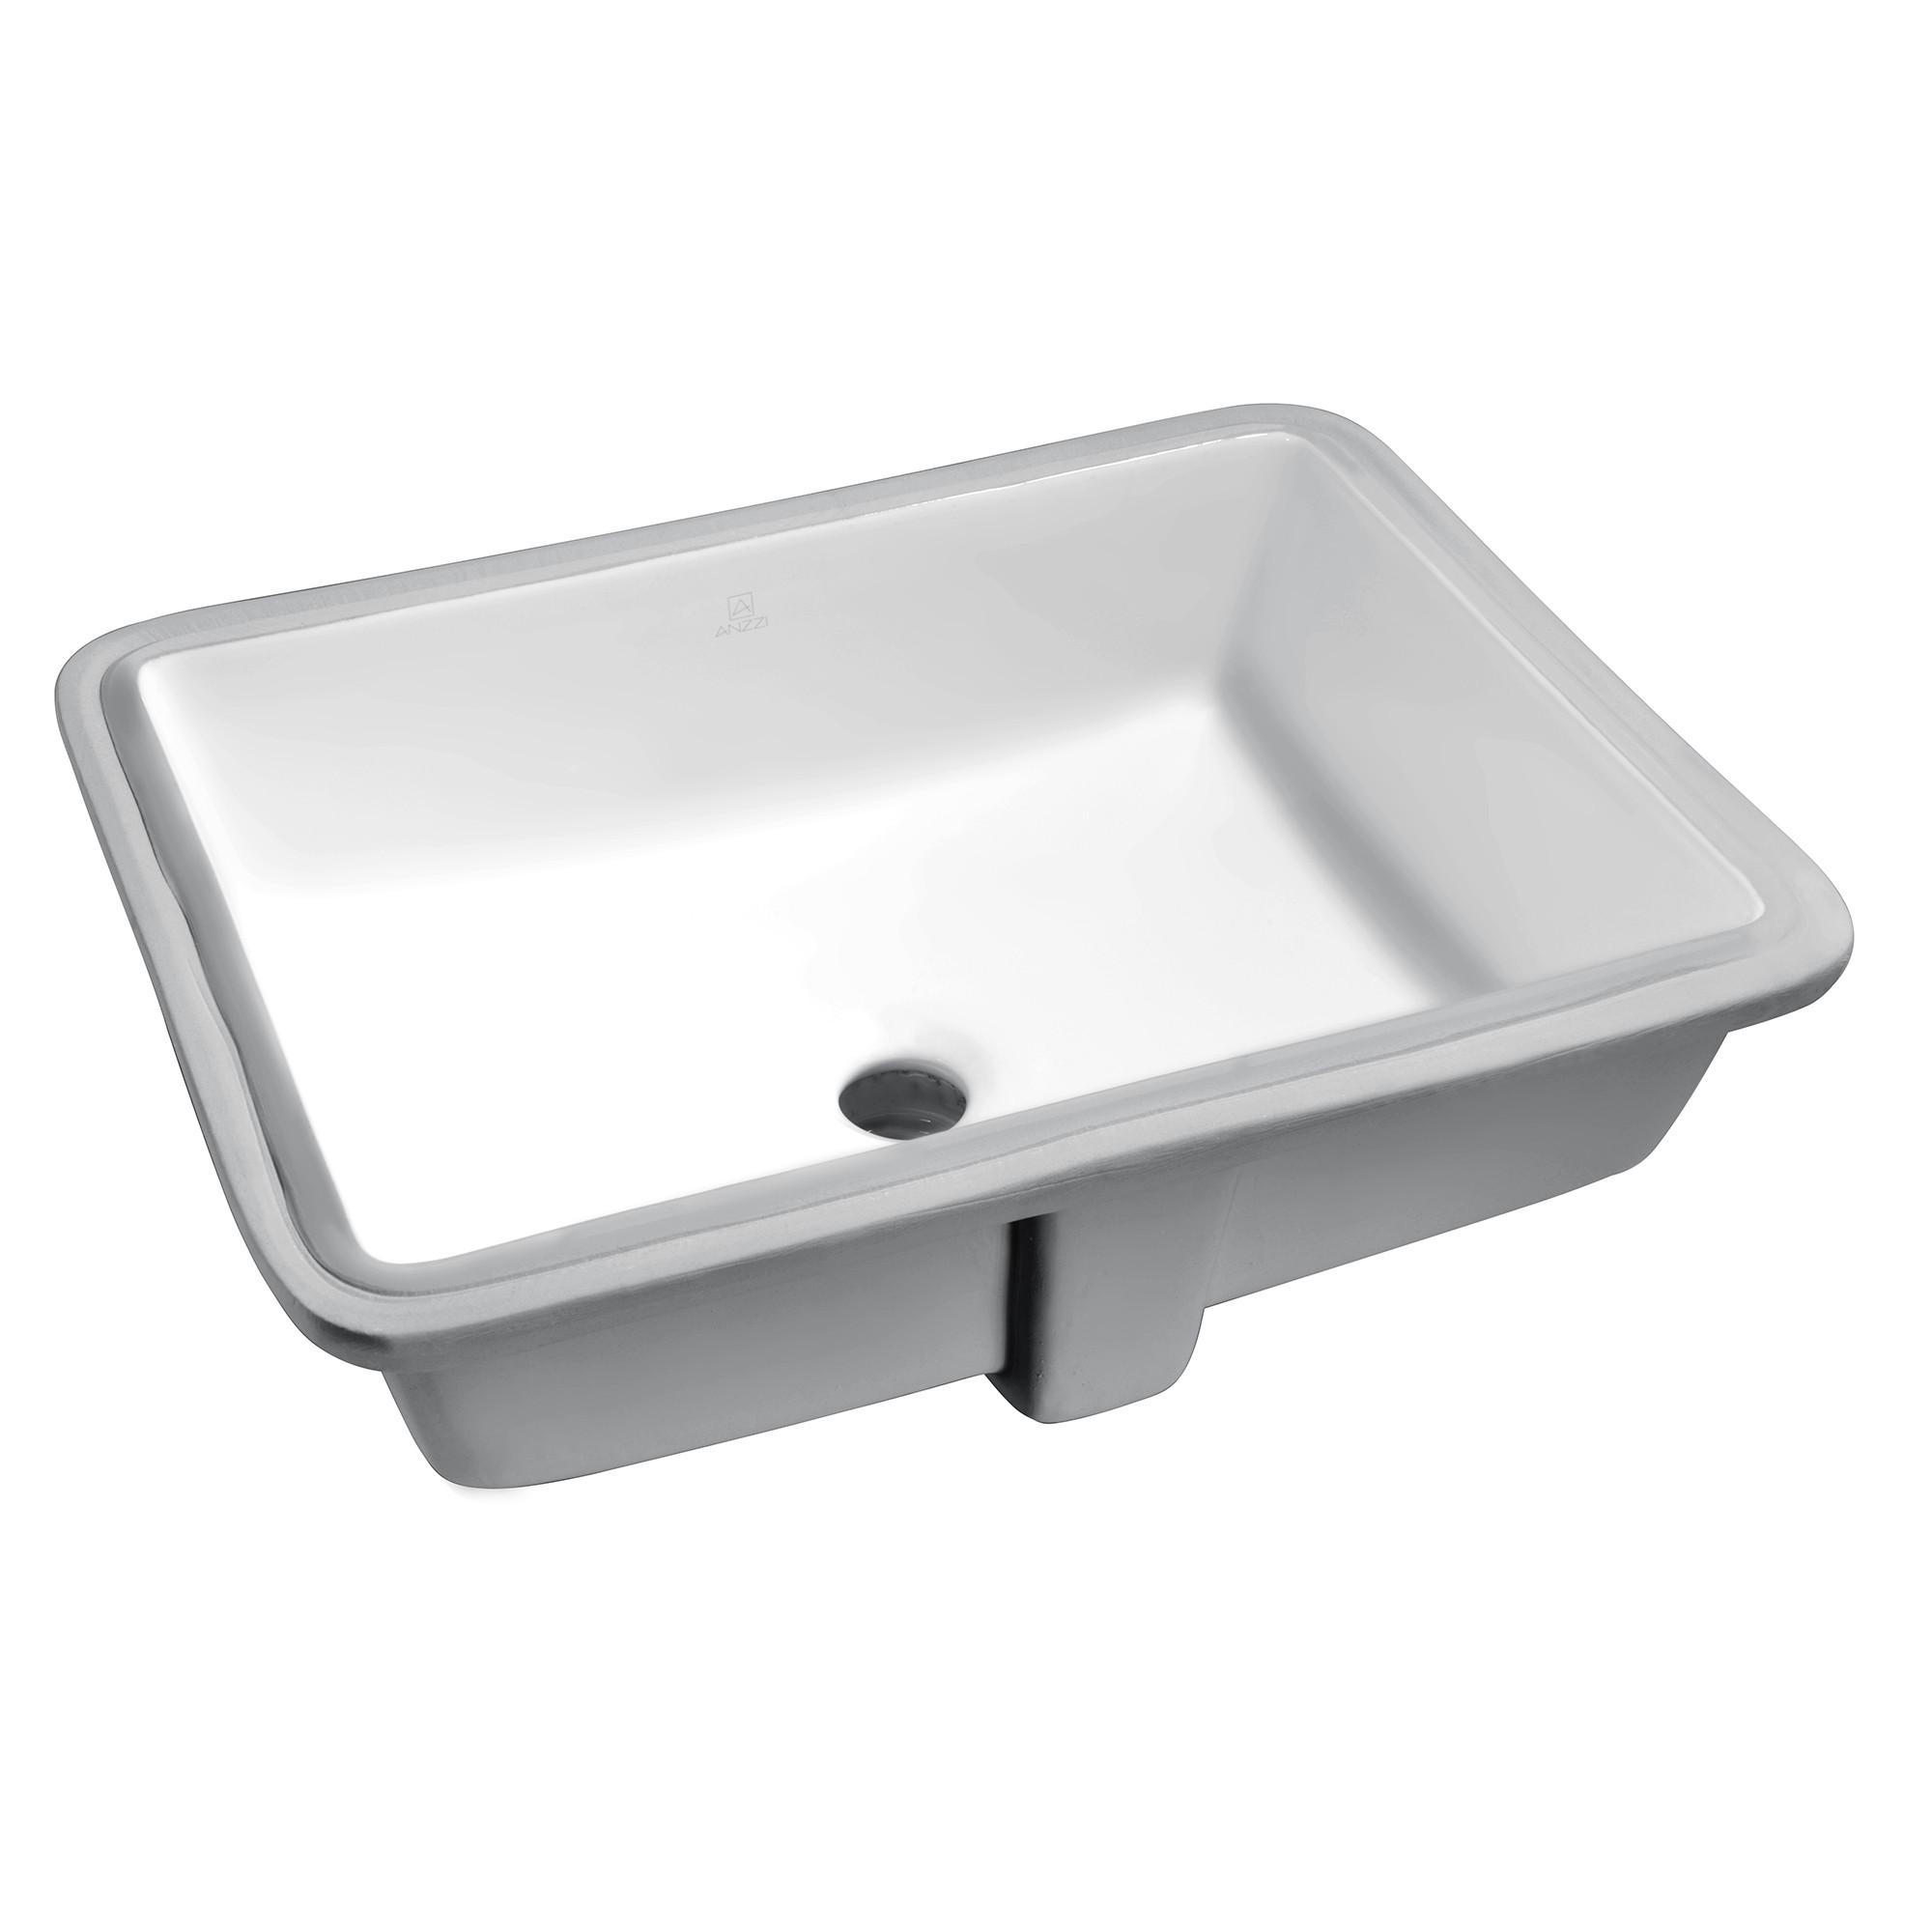 ANZZI LS-AZ128 Dahlia 19.5 Inch Ceramic Undermount Sink Basin in White